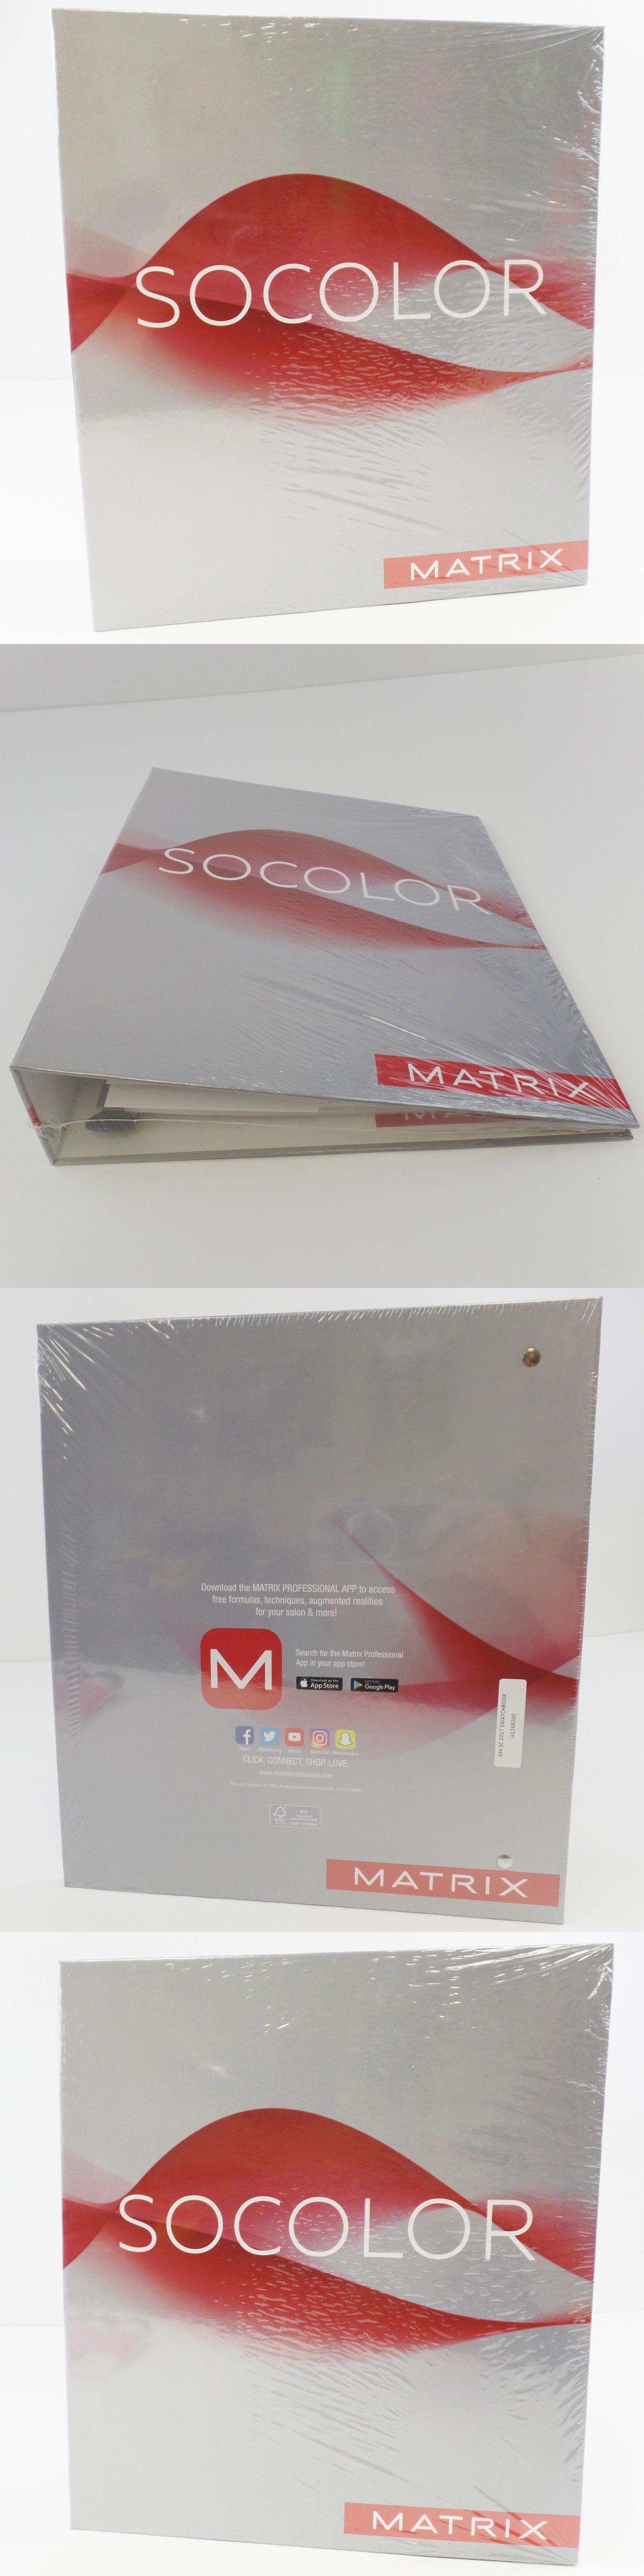 hair color matrix socolor swatch book sealed 2017 new buy it now only - Matrix So Color Swatch Book